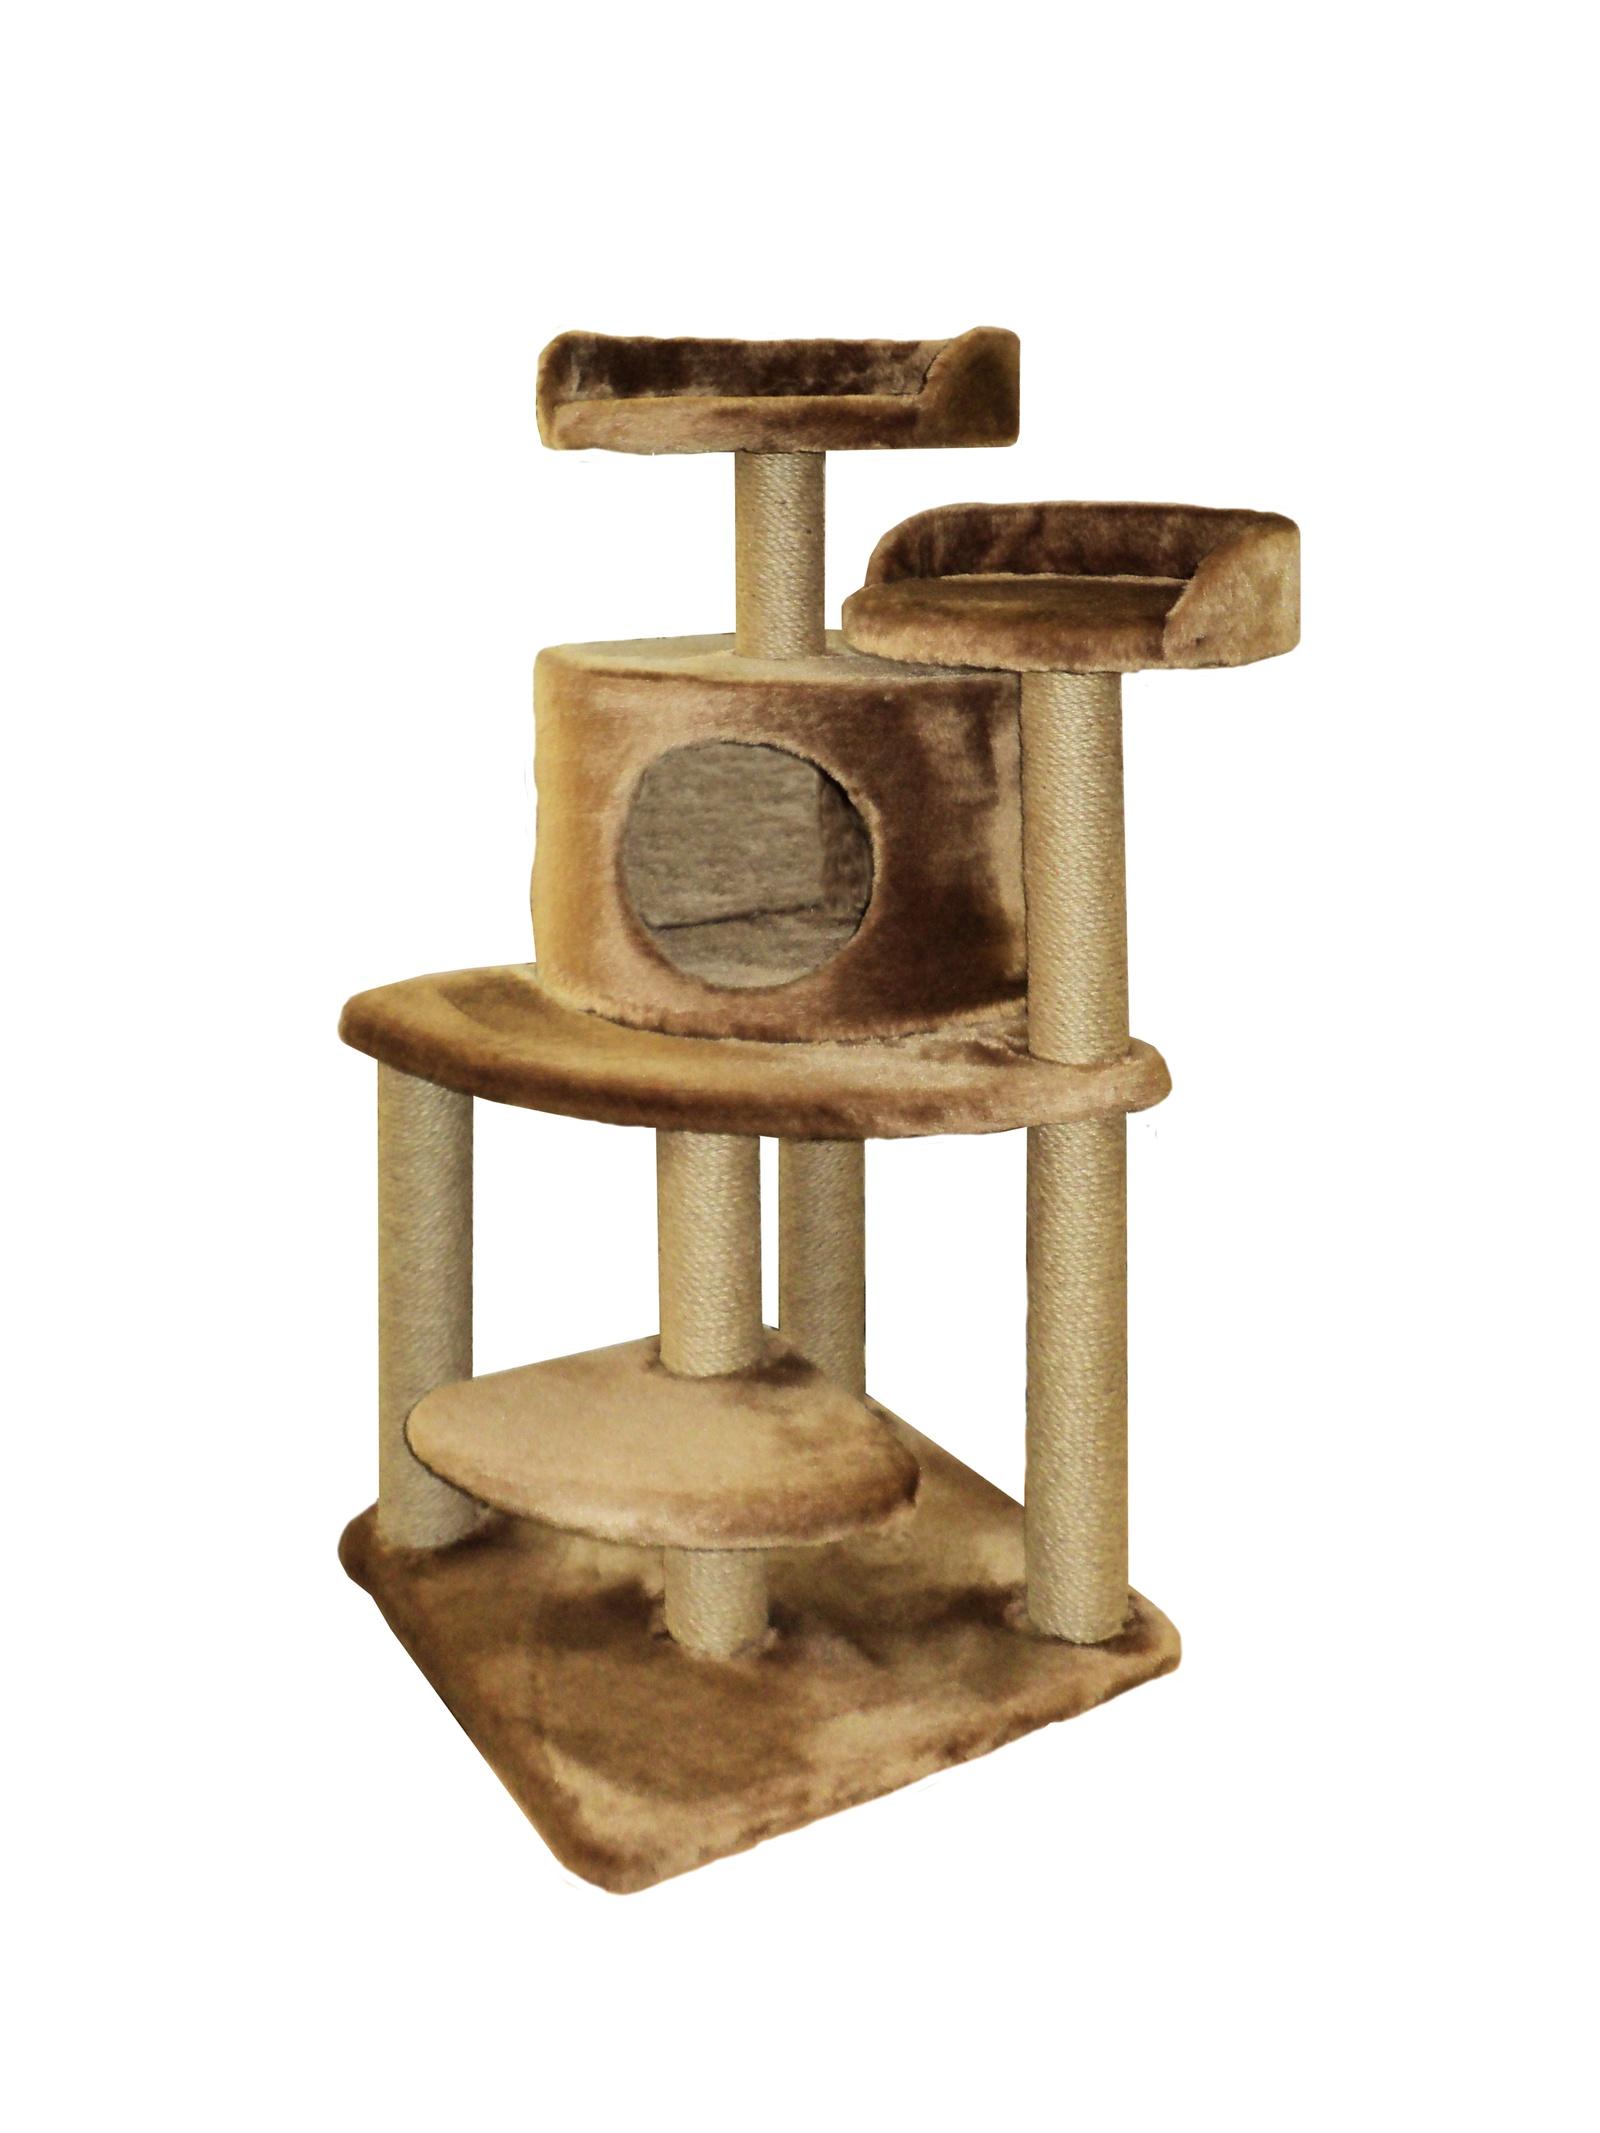 Домик - когтеточка Майя, коричневый, джут 50х50х100 домик когтеточка барсик серый джут 60х60х110